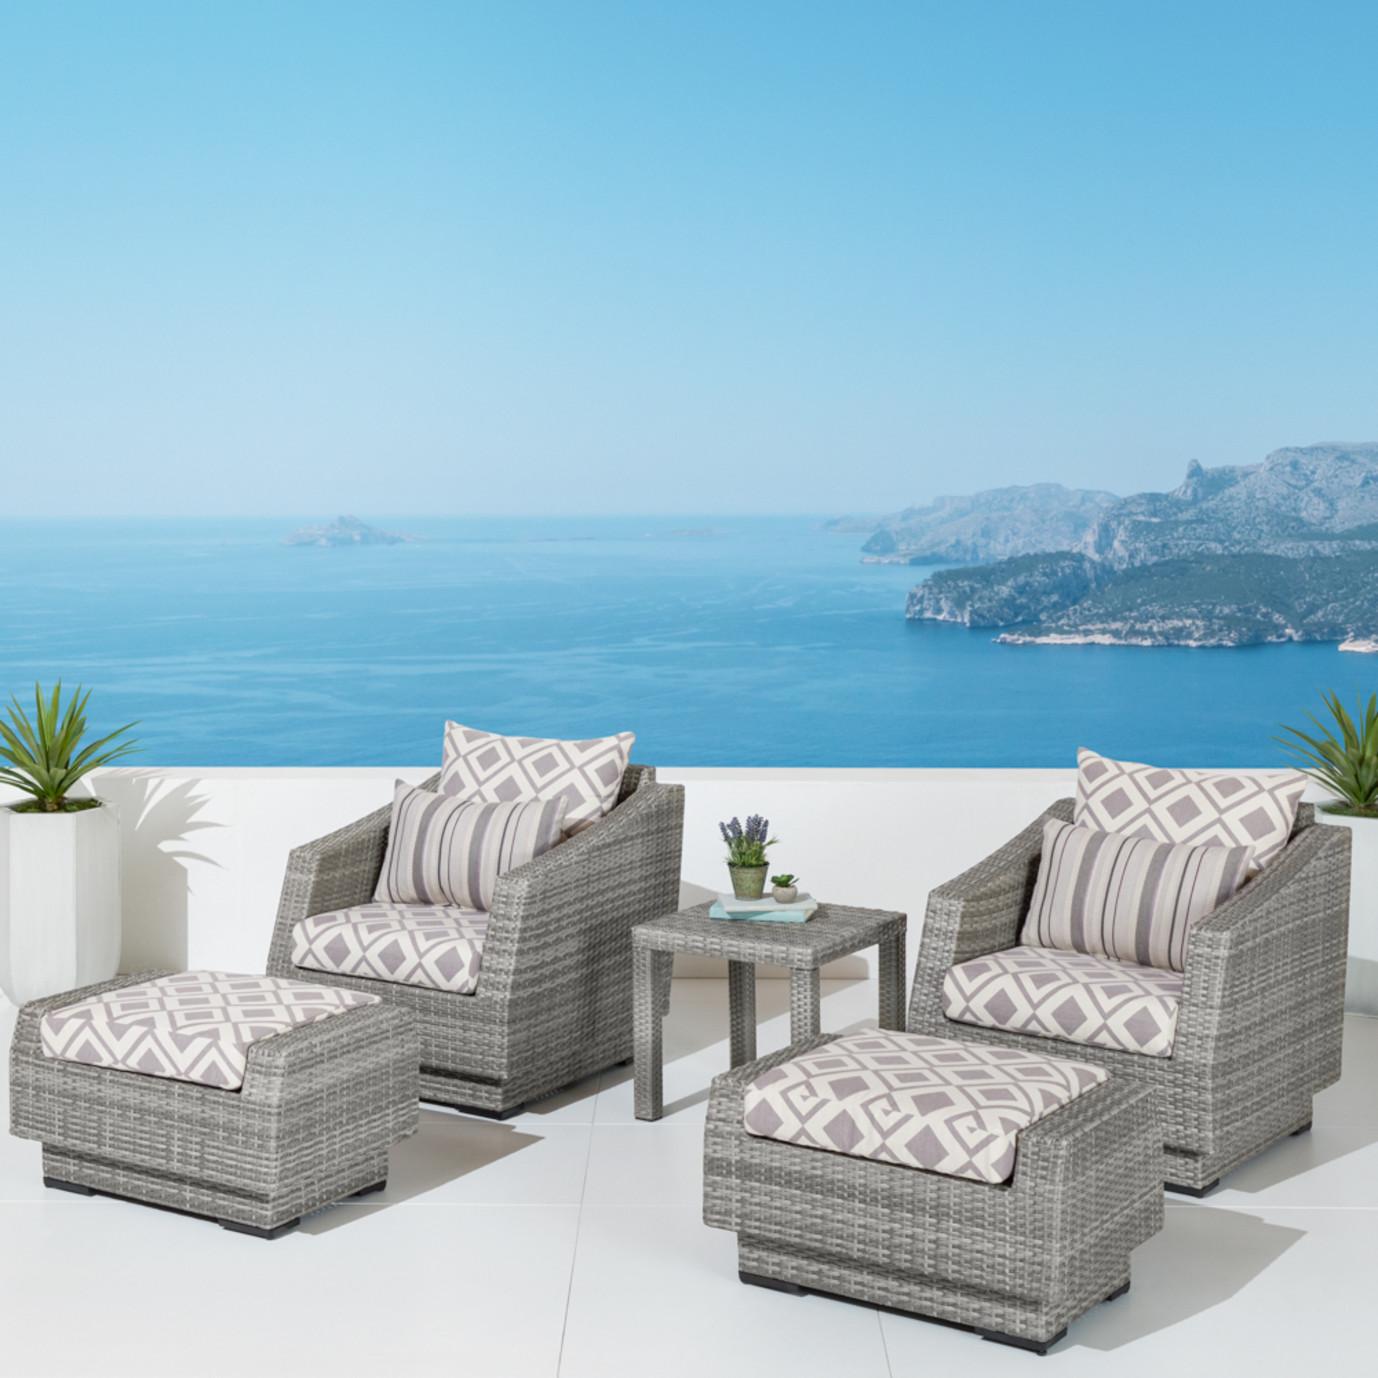 Cannes™ 5pc Club Chair & Ottoman Set - Wisteria Lavender